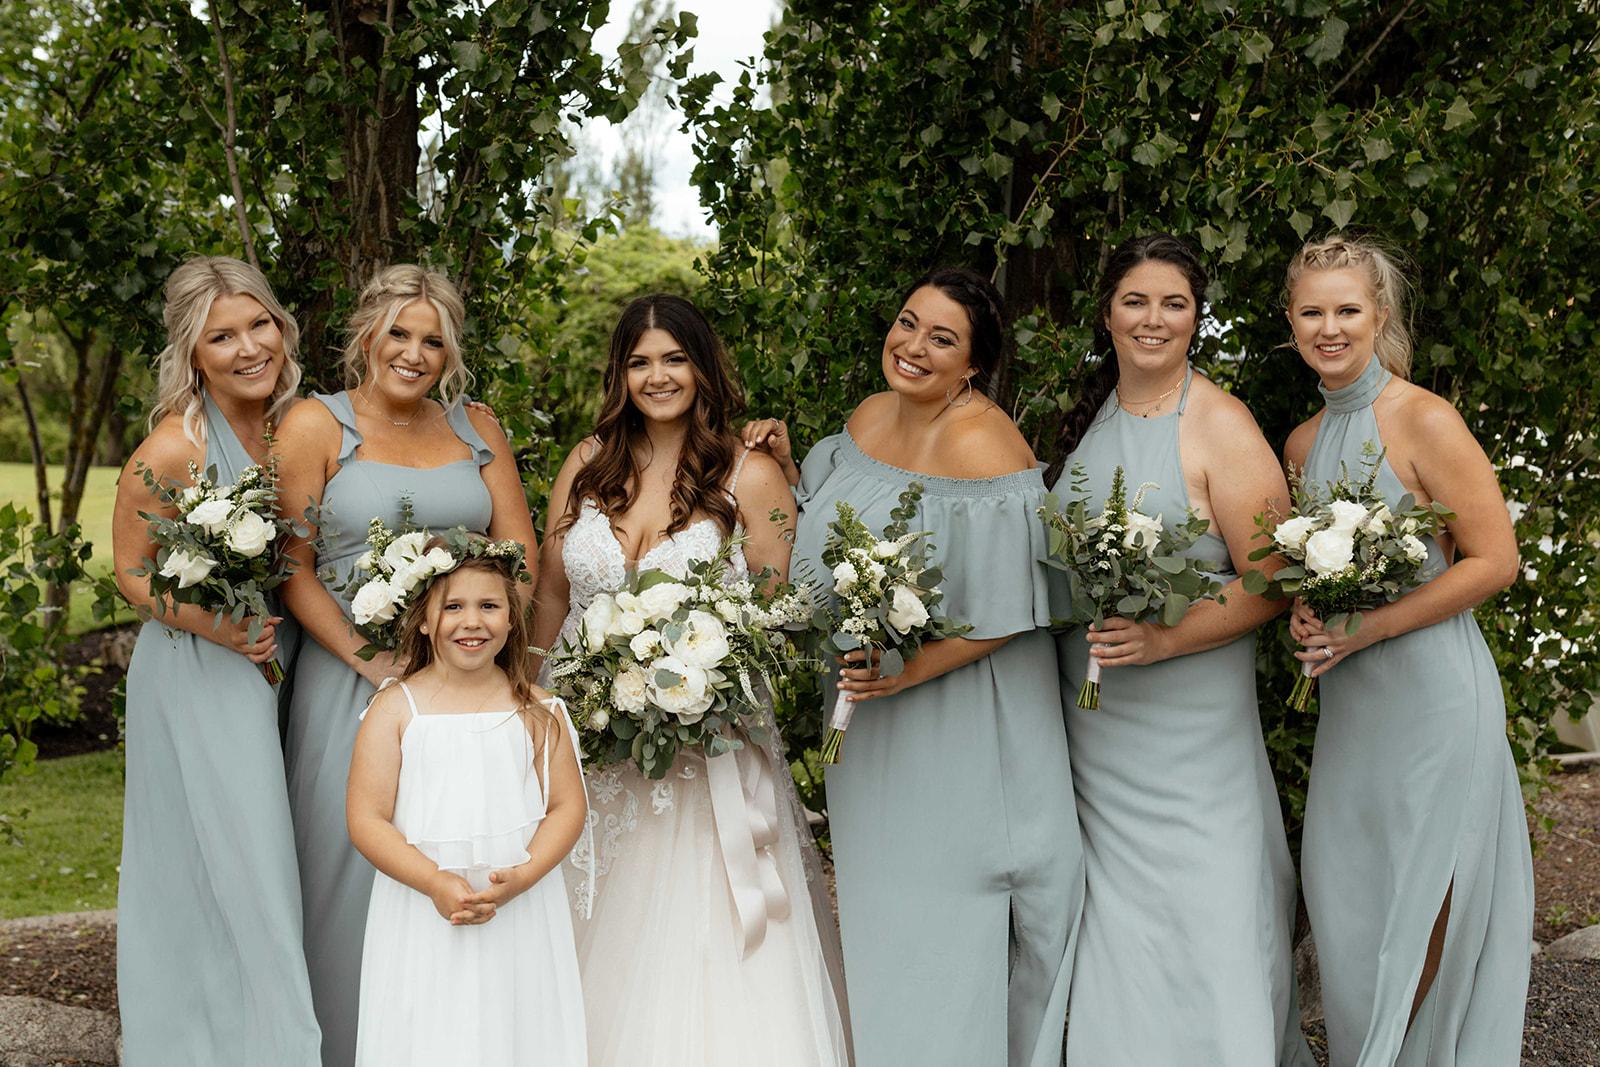 beacon hill wedding honest in ivory dress spokane bridemaids